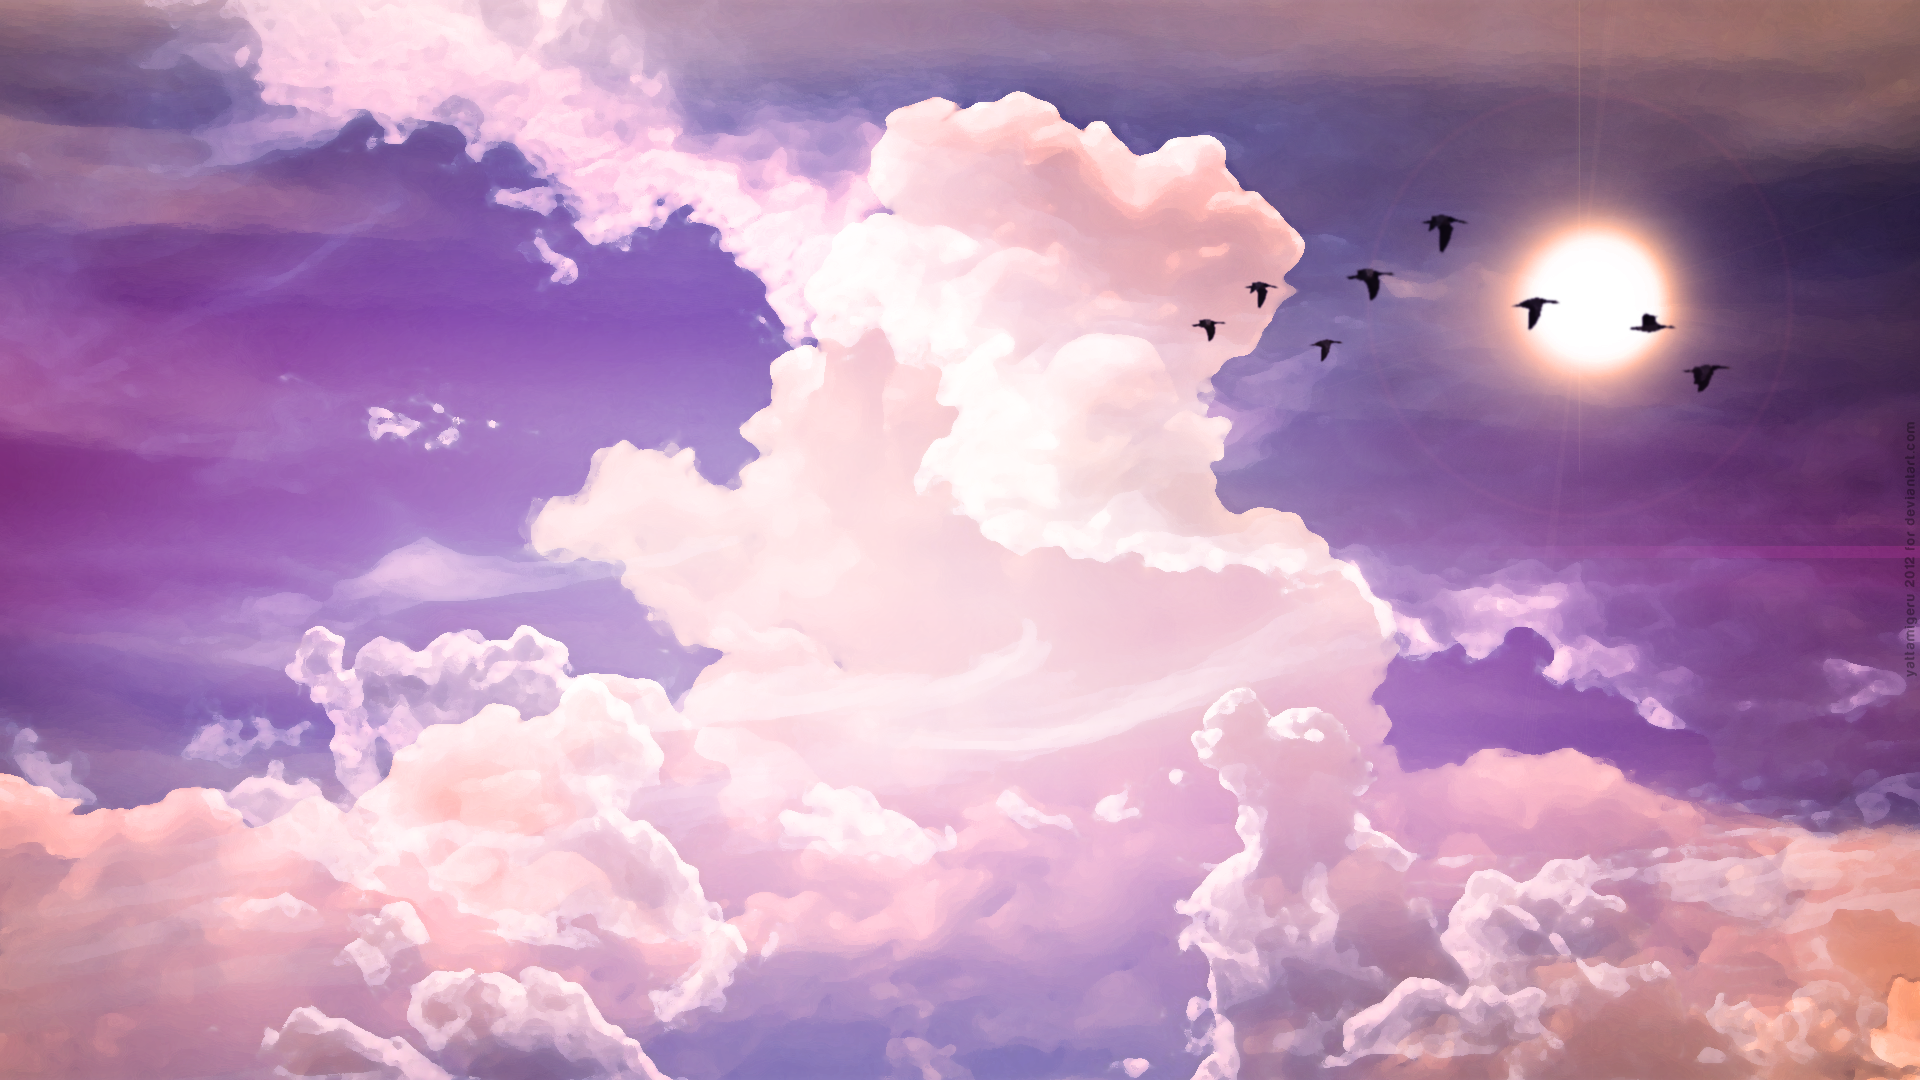 Tumblr Backgrounds wallpaper 1920x1080 45513 1920x1080